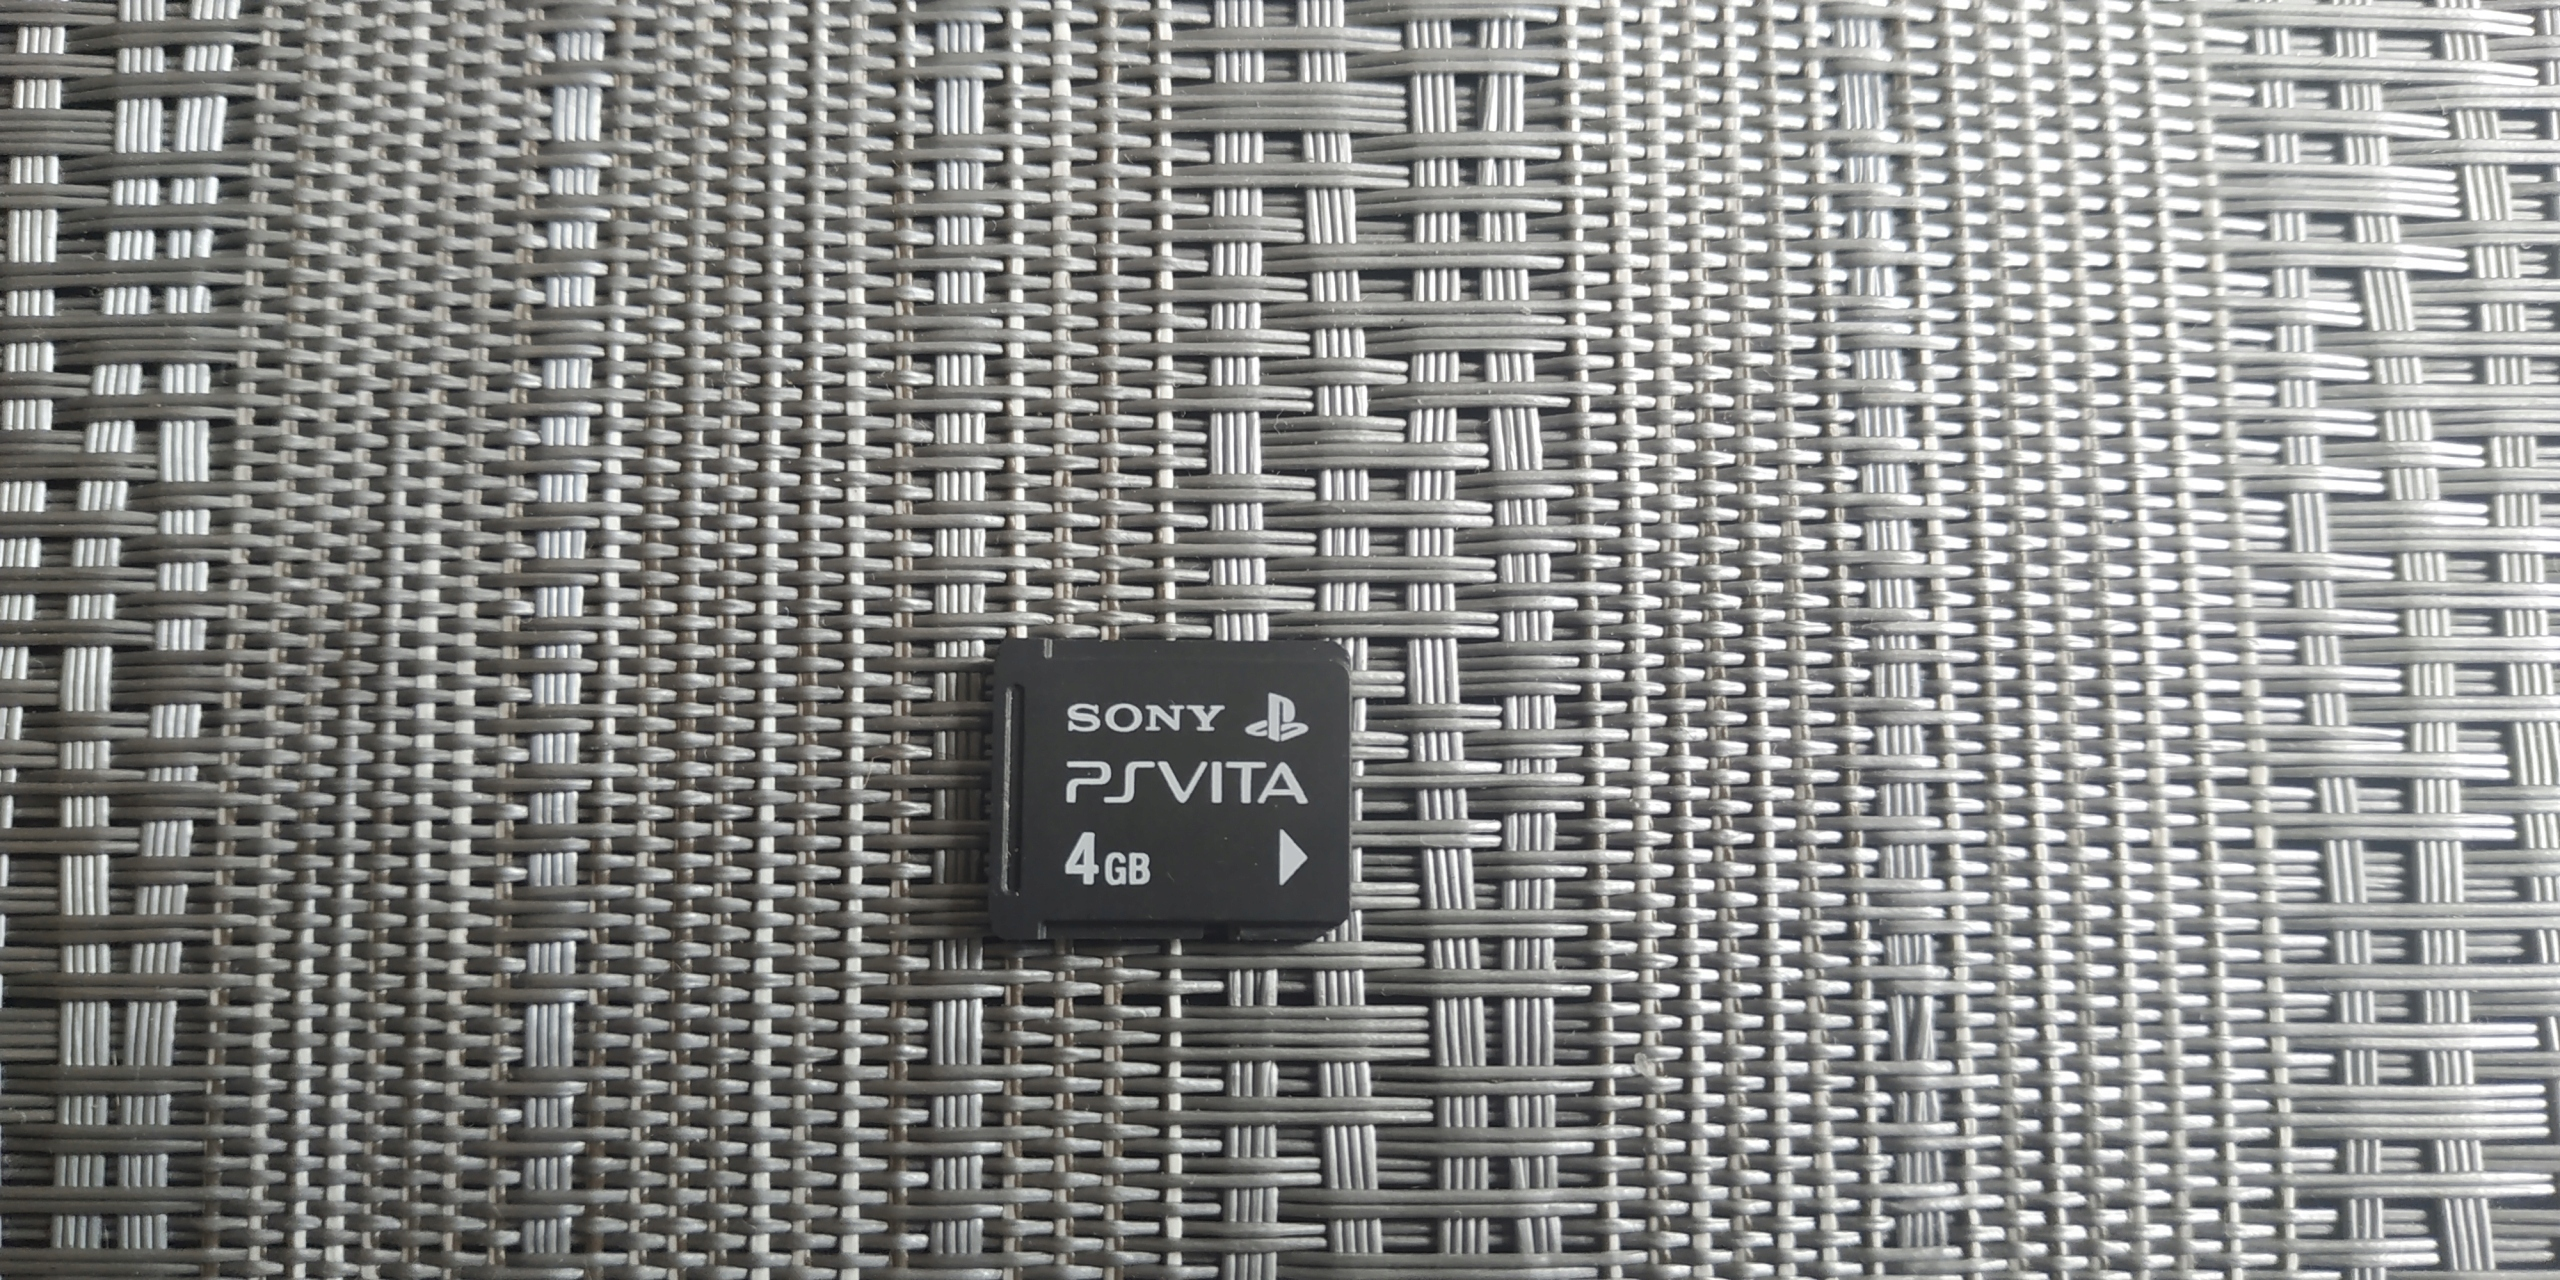 Karta Pamięci PS Vita / PS TV 4GB